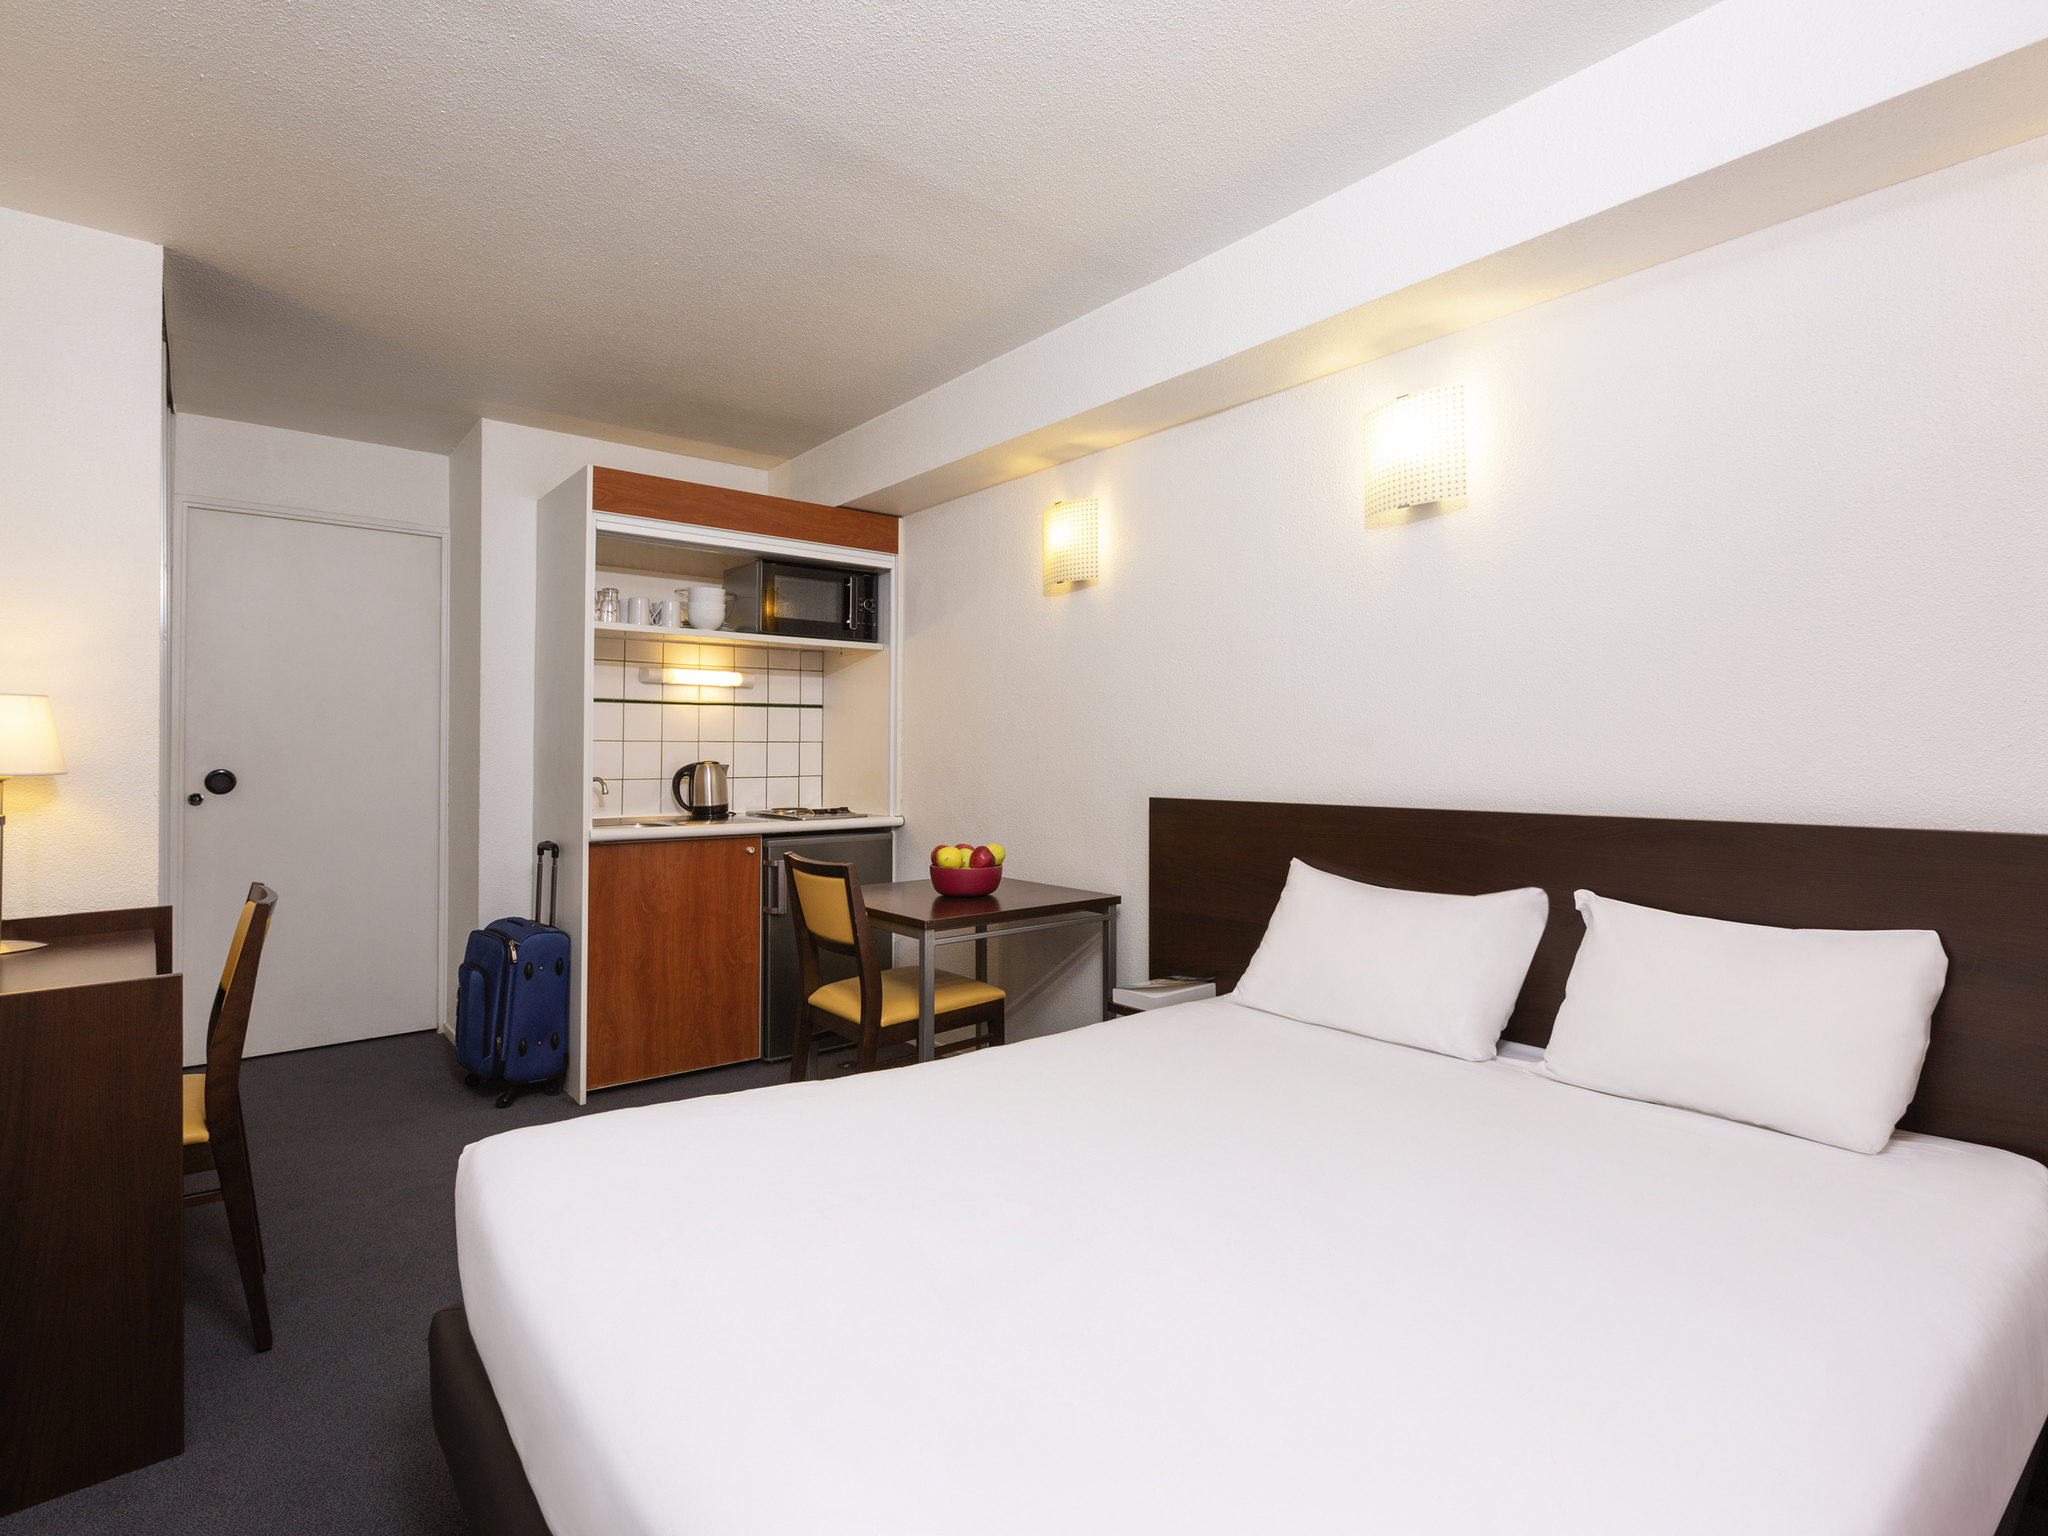 Hotel - Aparthotel Adagio access La Défense Léonard de Vinci